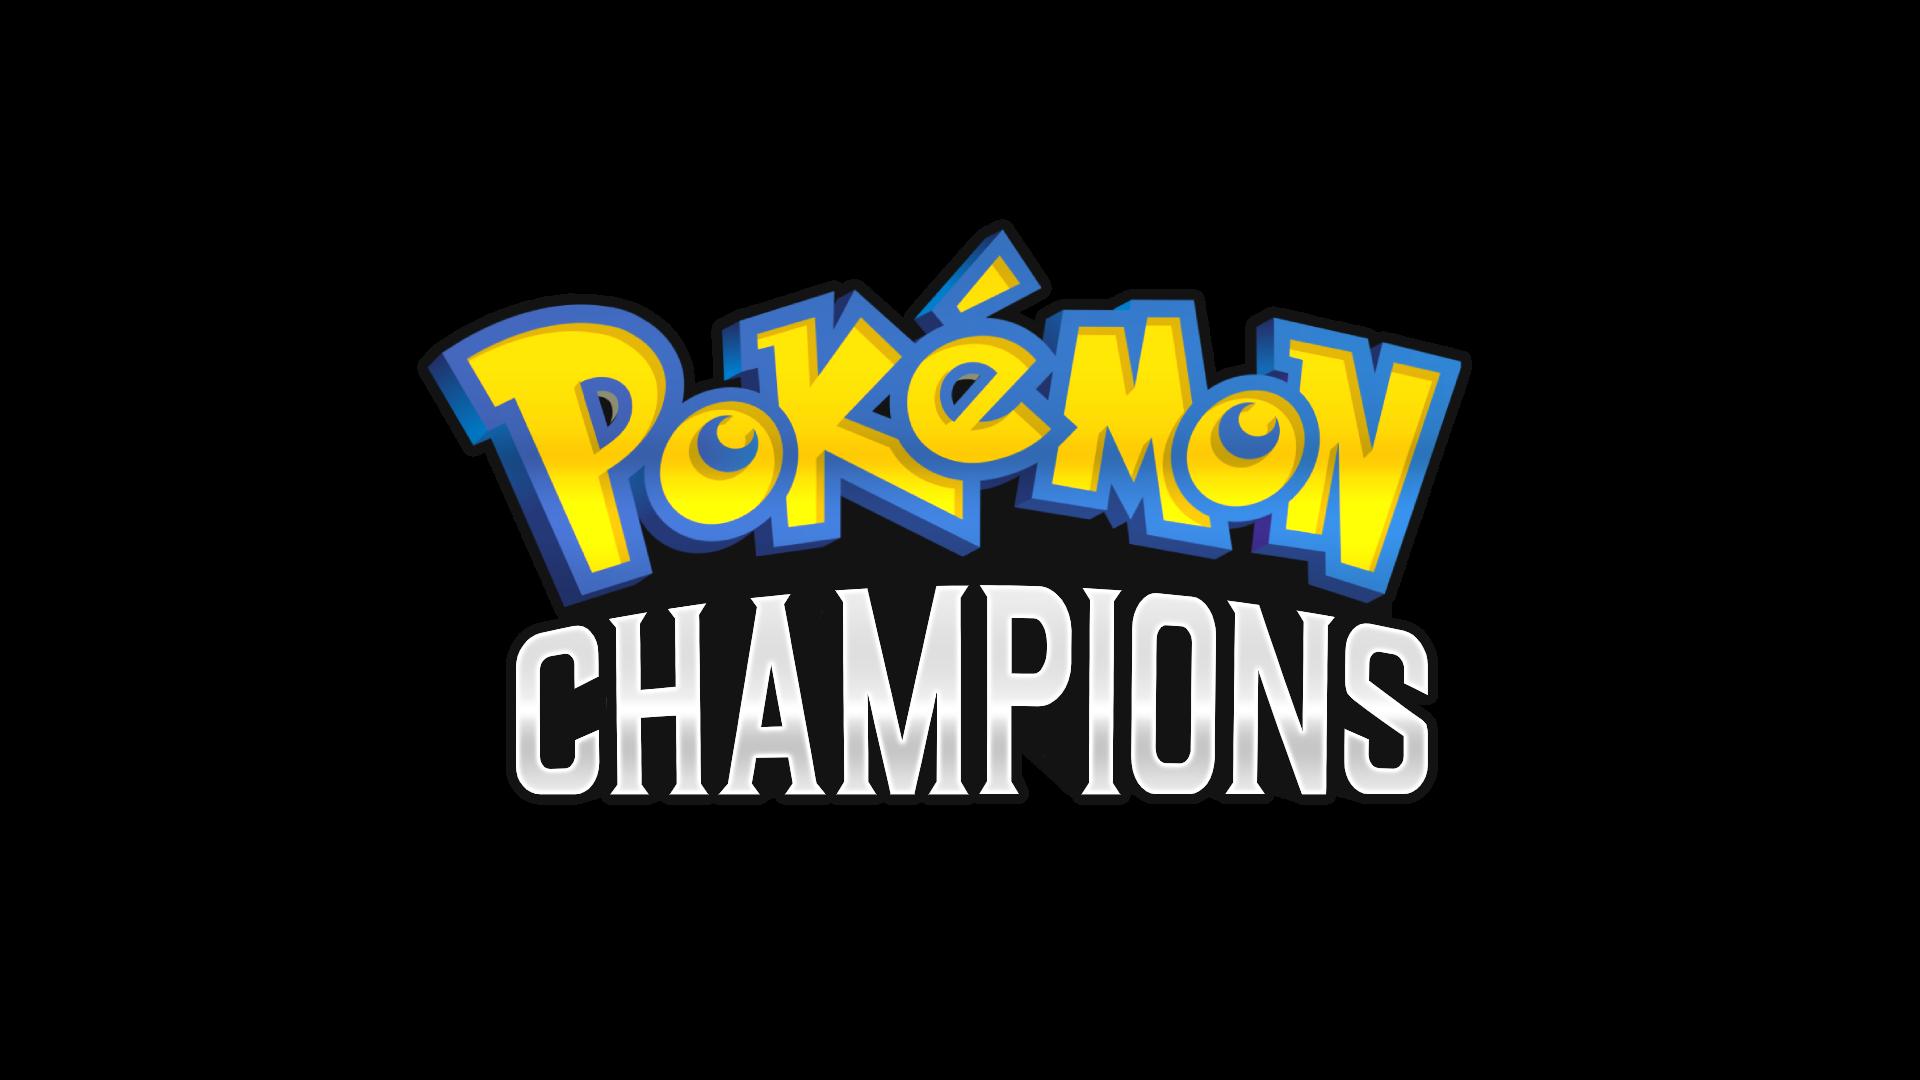 Pokemon_champions (1).png